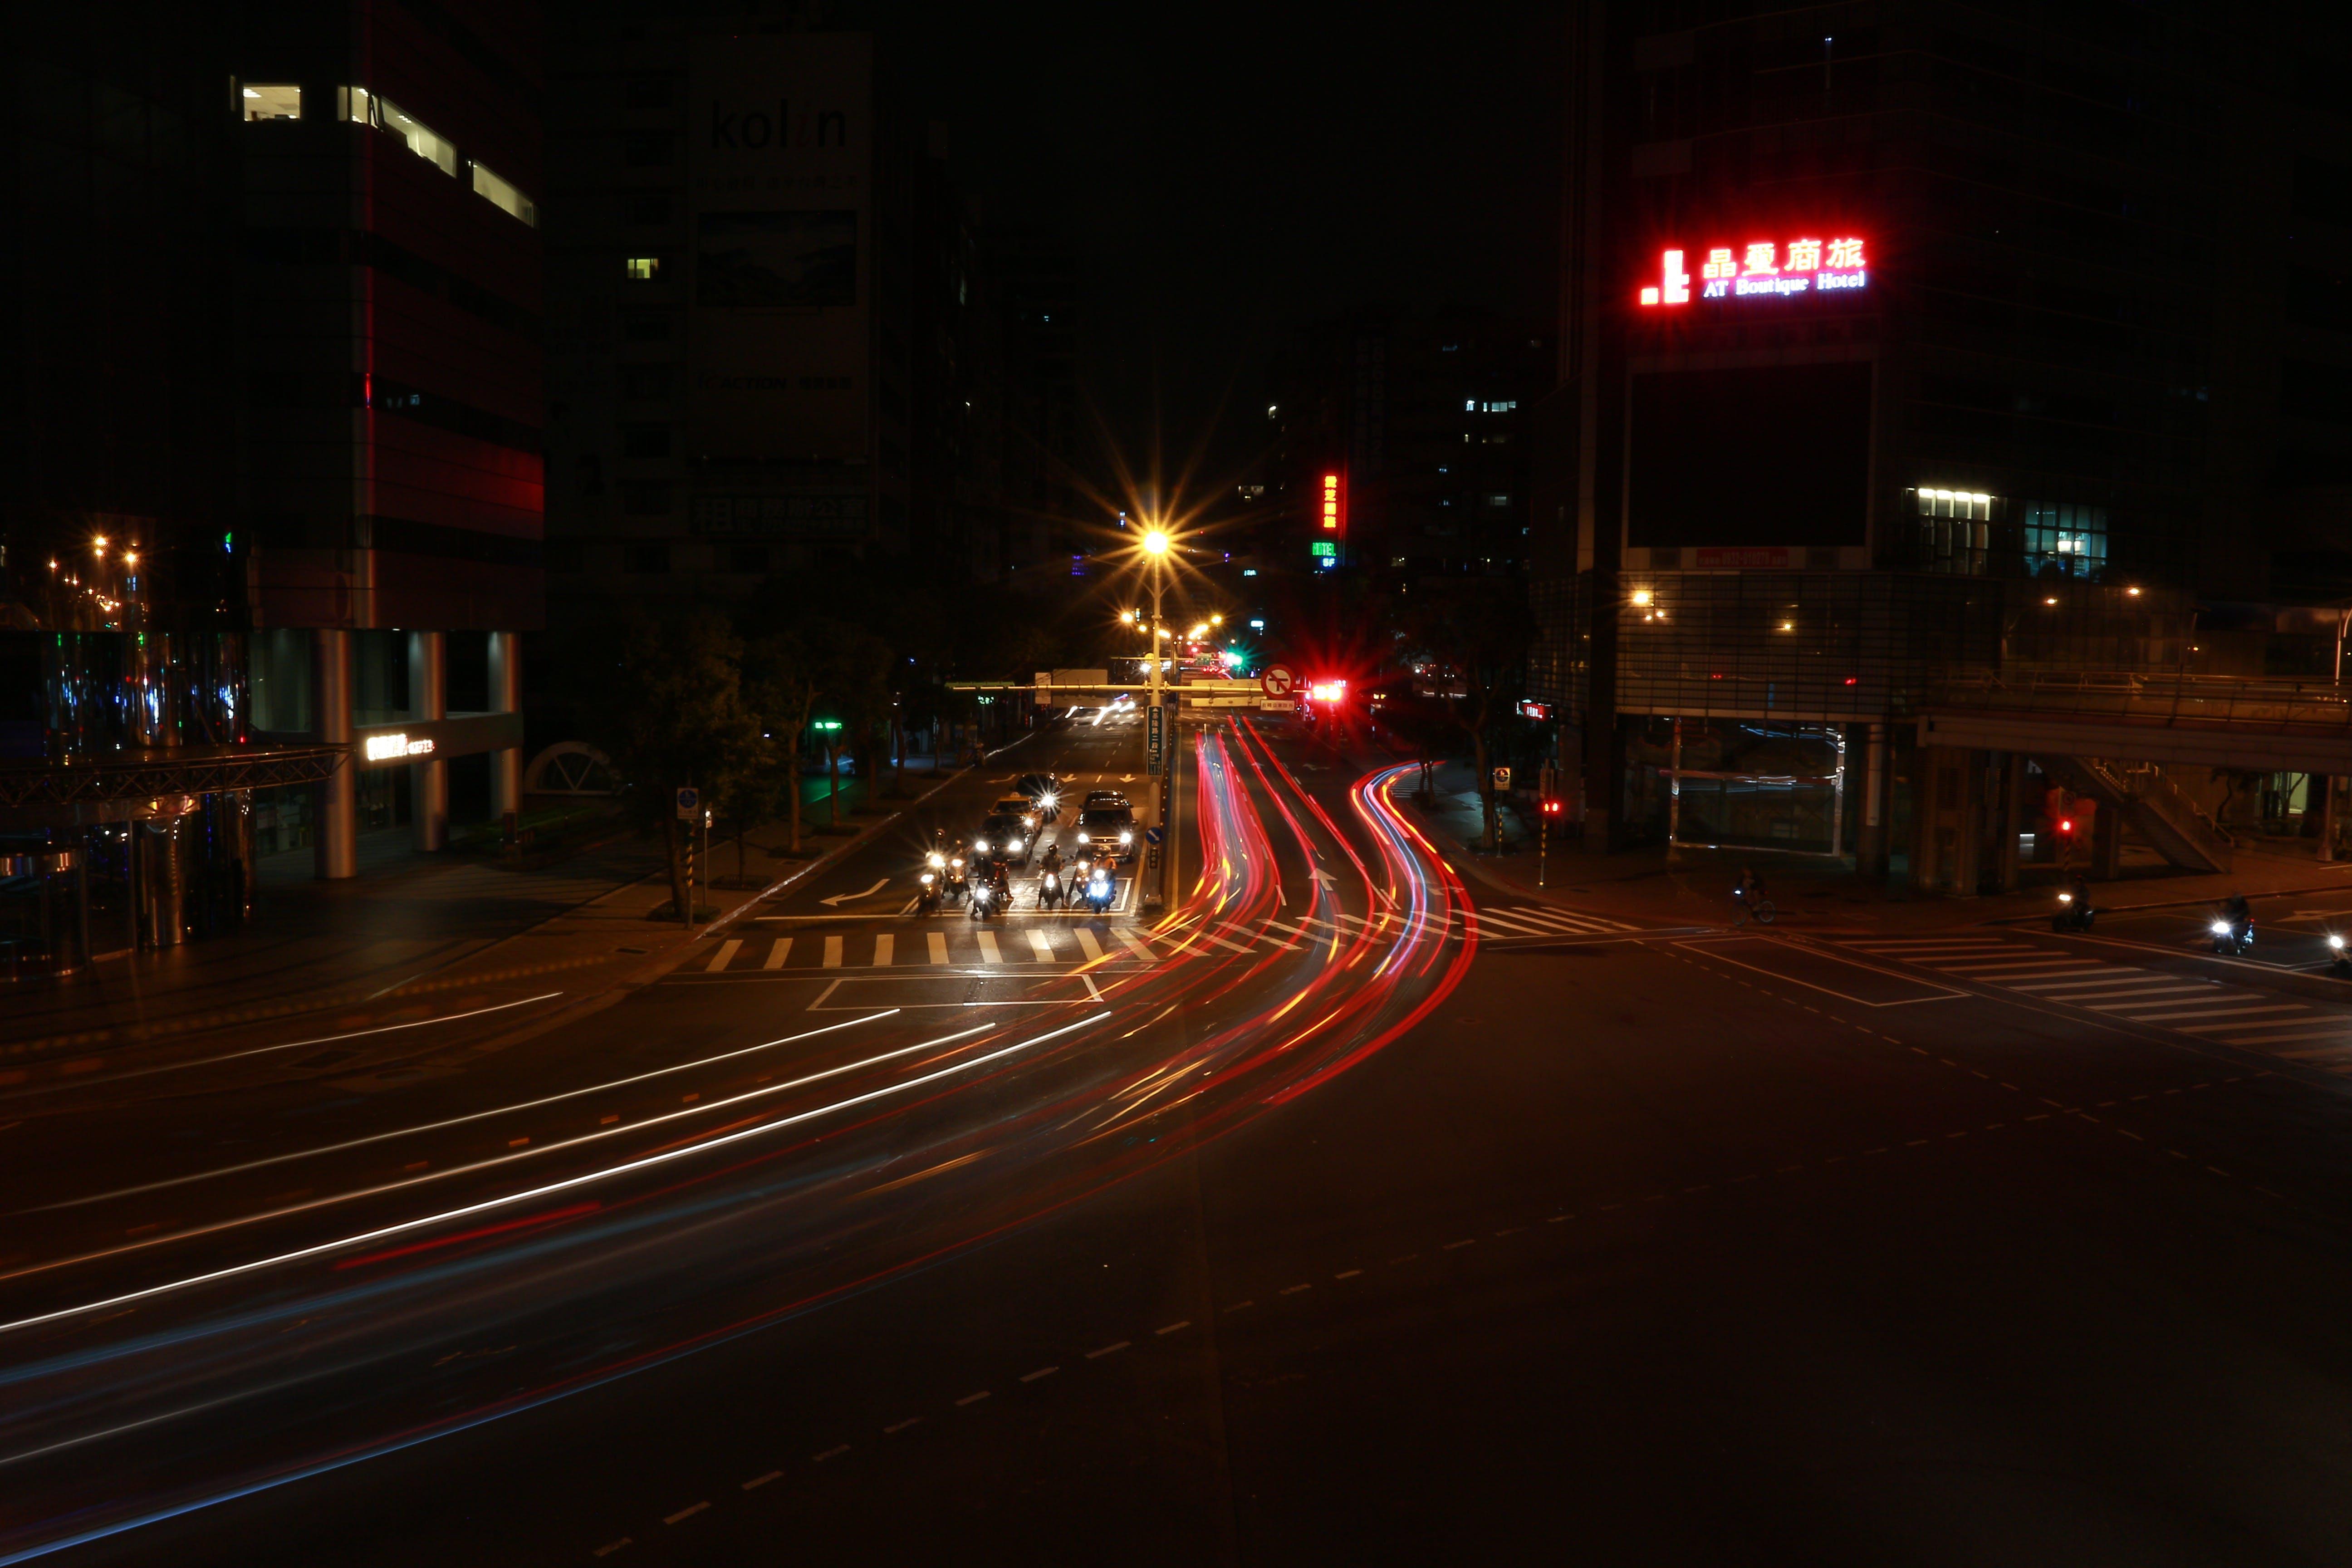 cars, city, dark